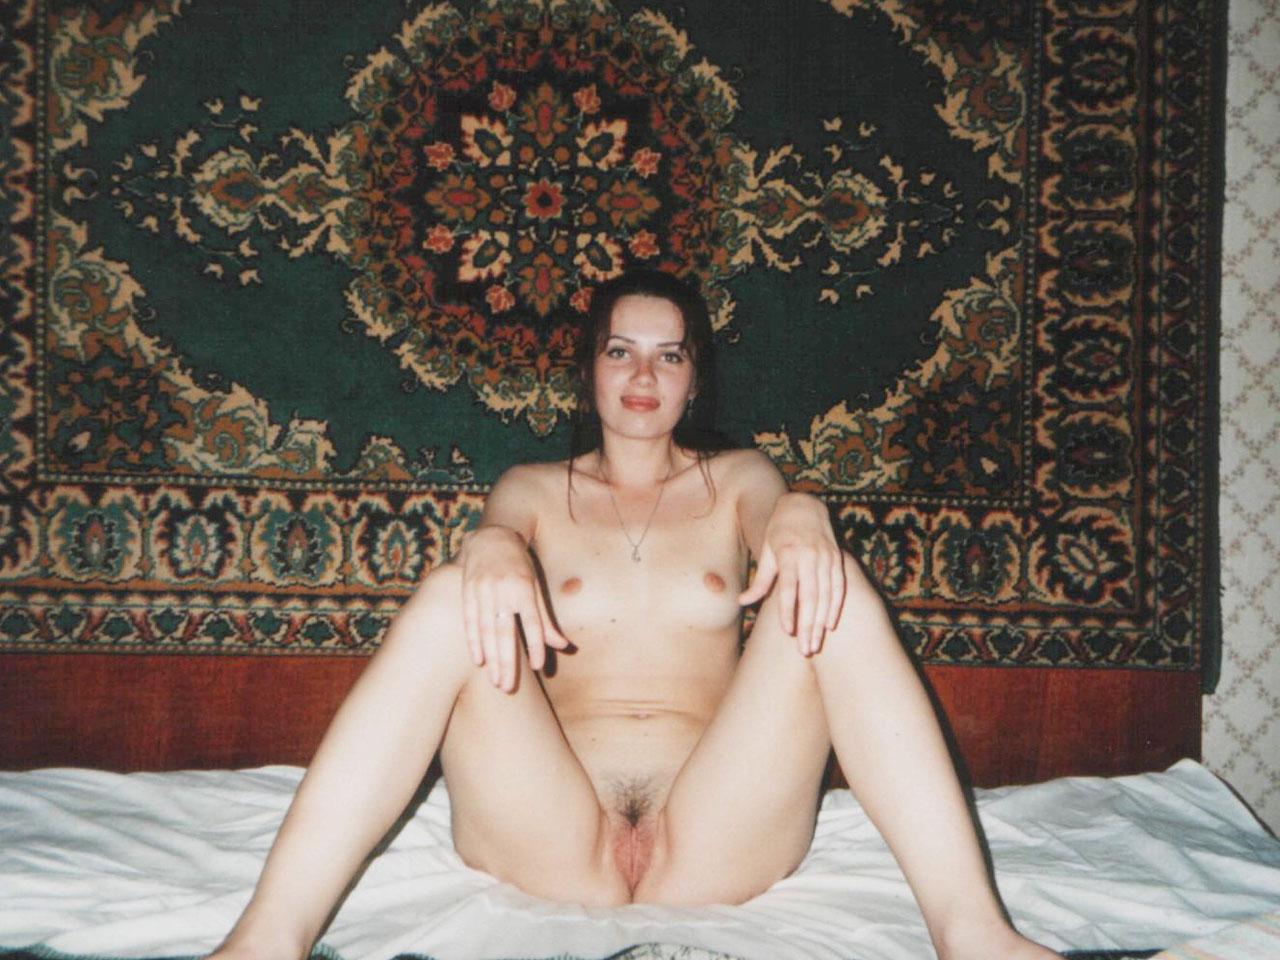 intim-foto-2000